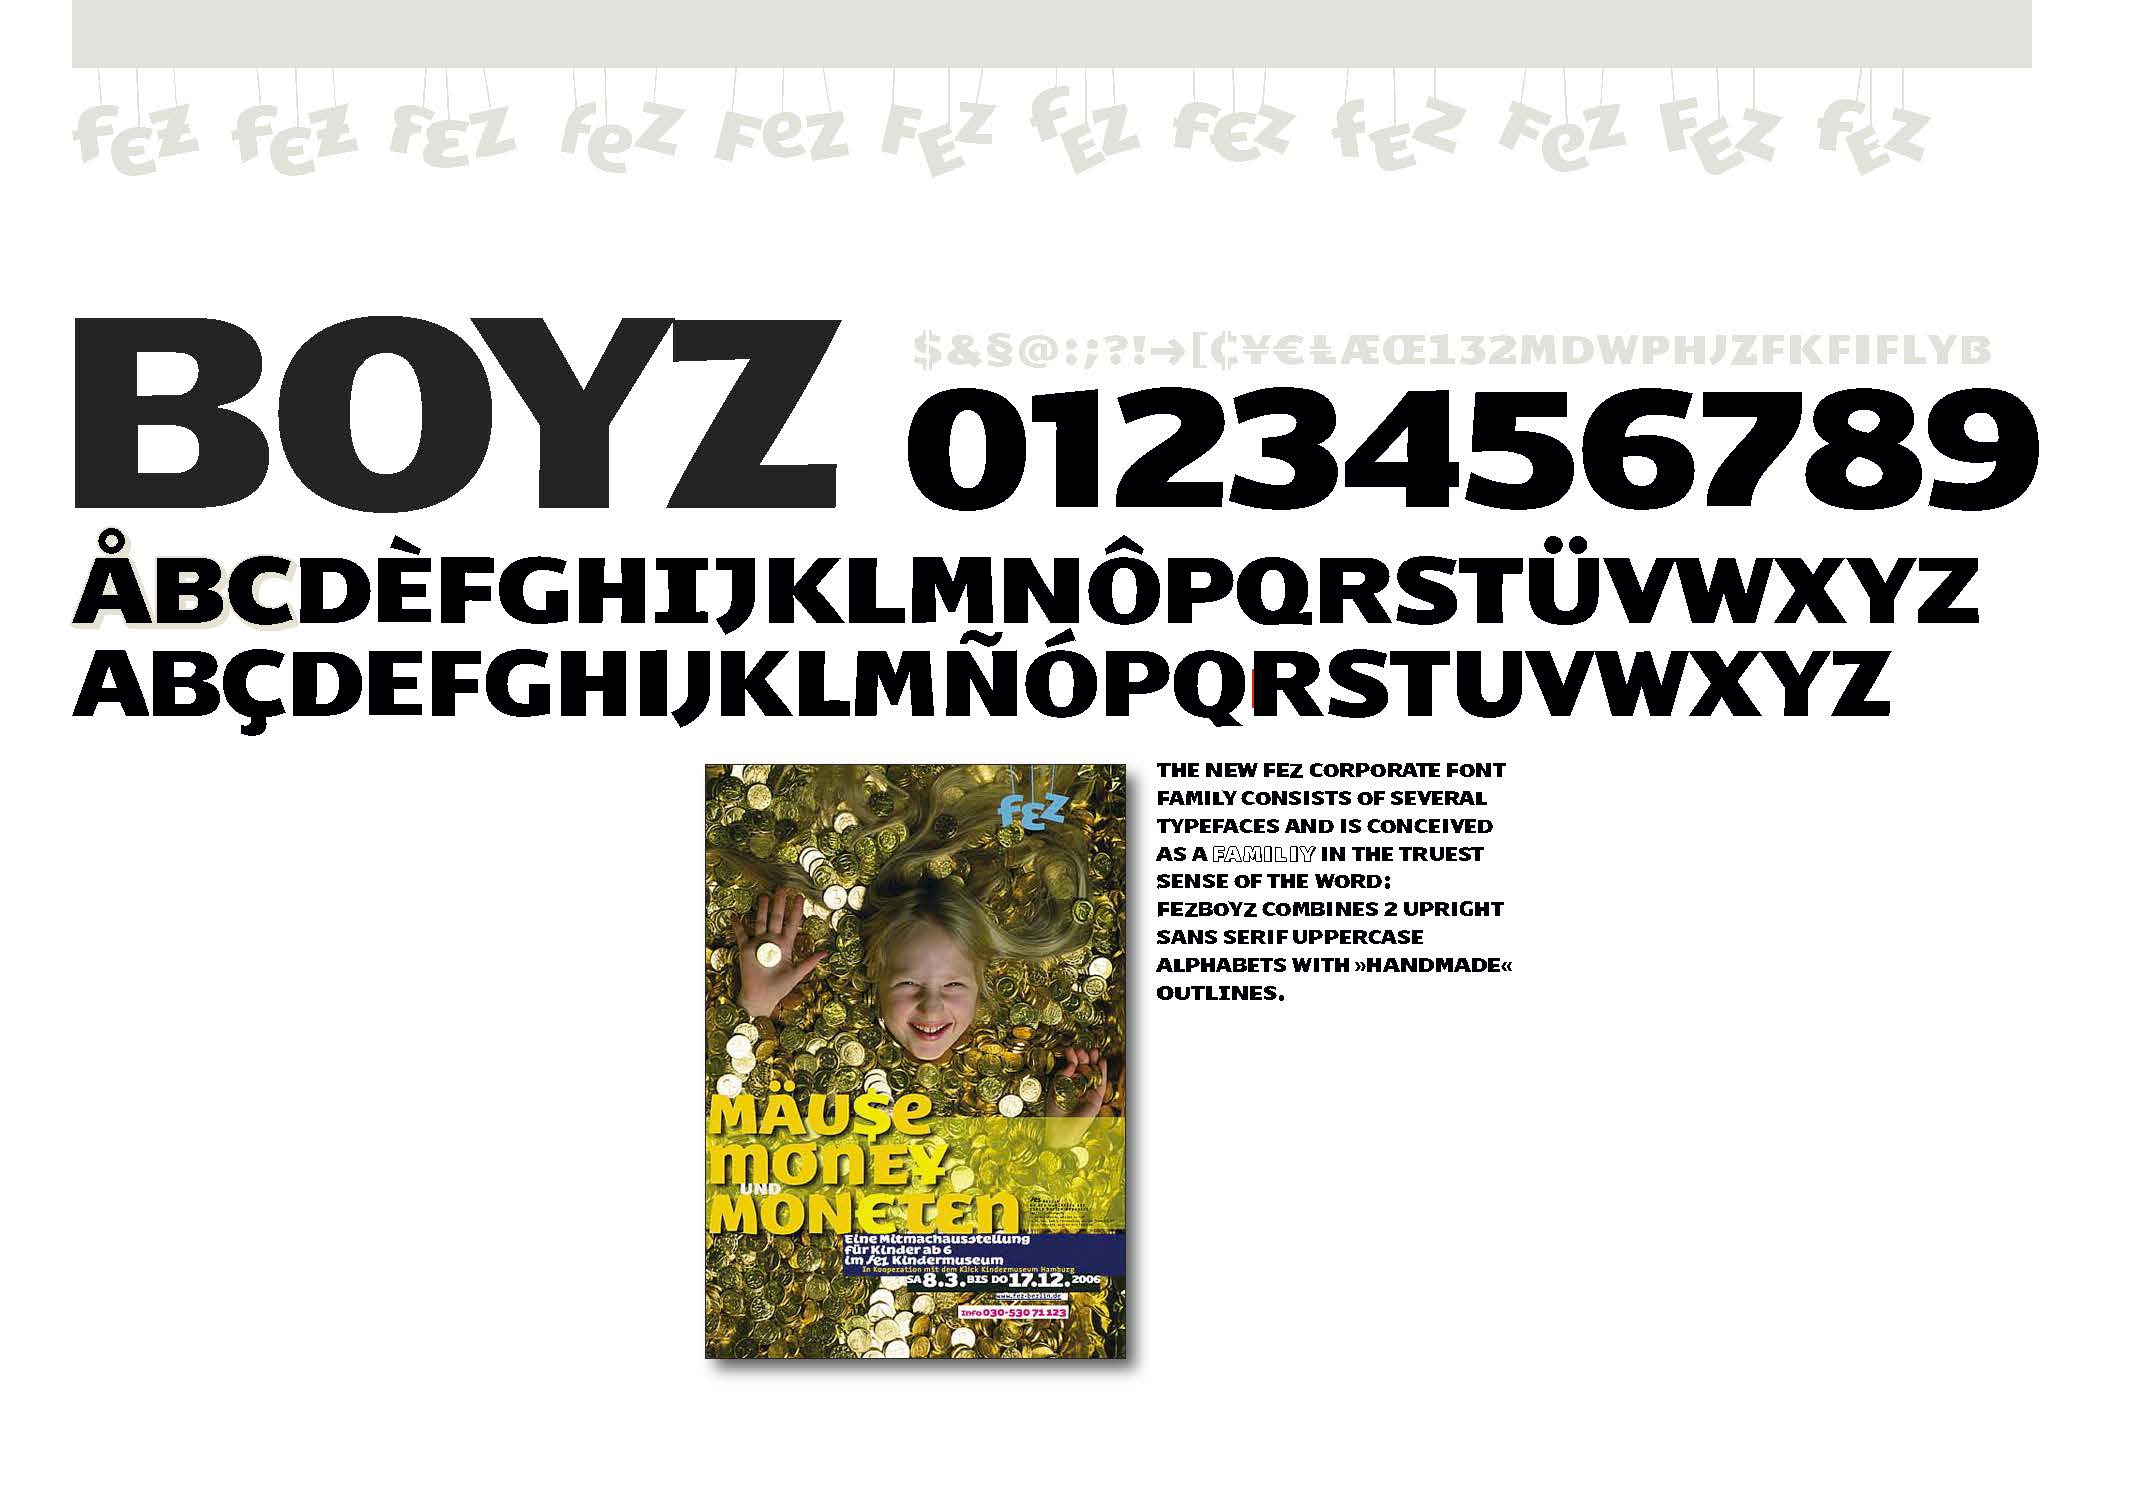 FEZ_FontRGB_kl_Seite_2